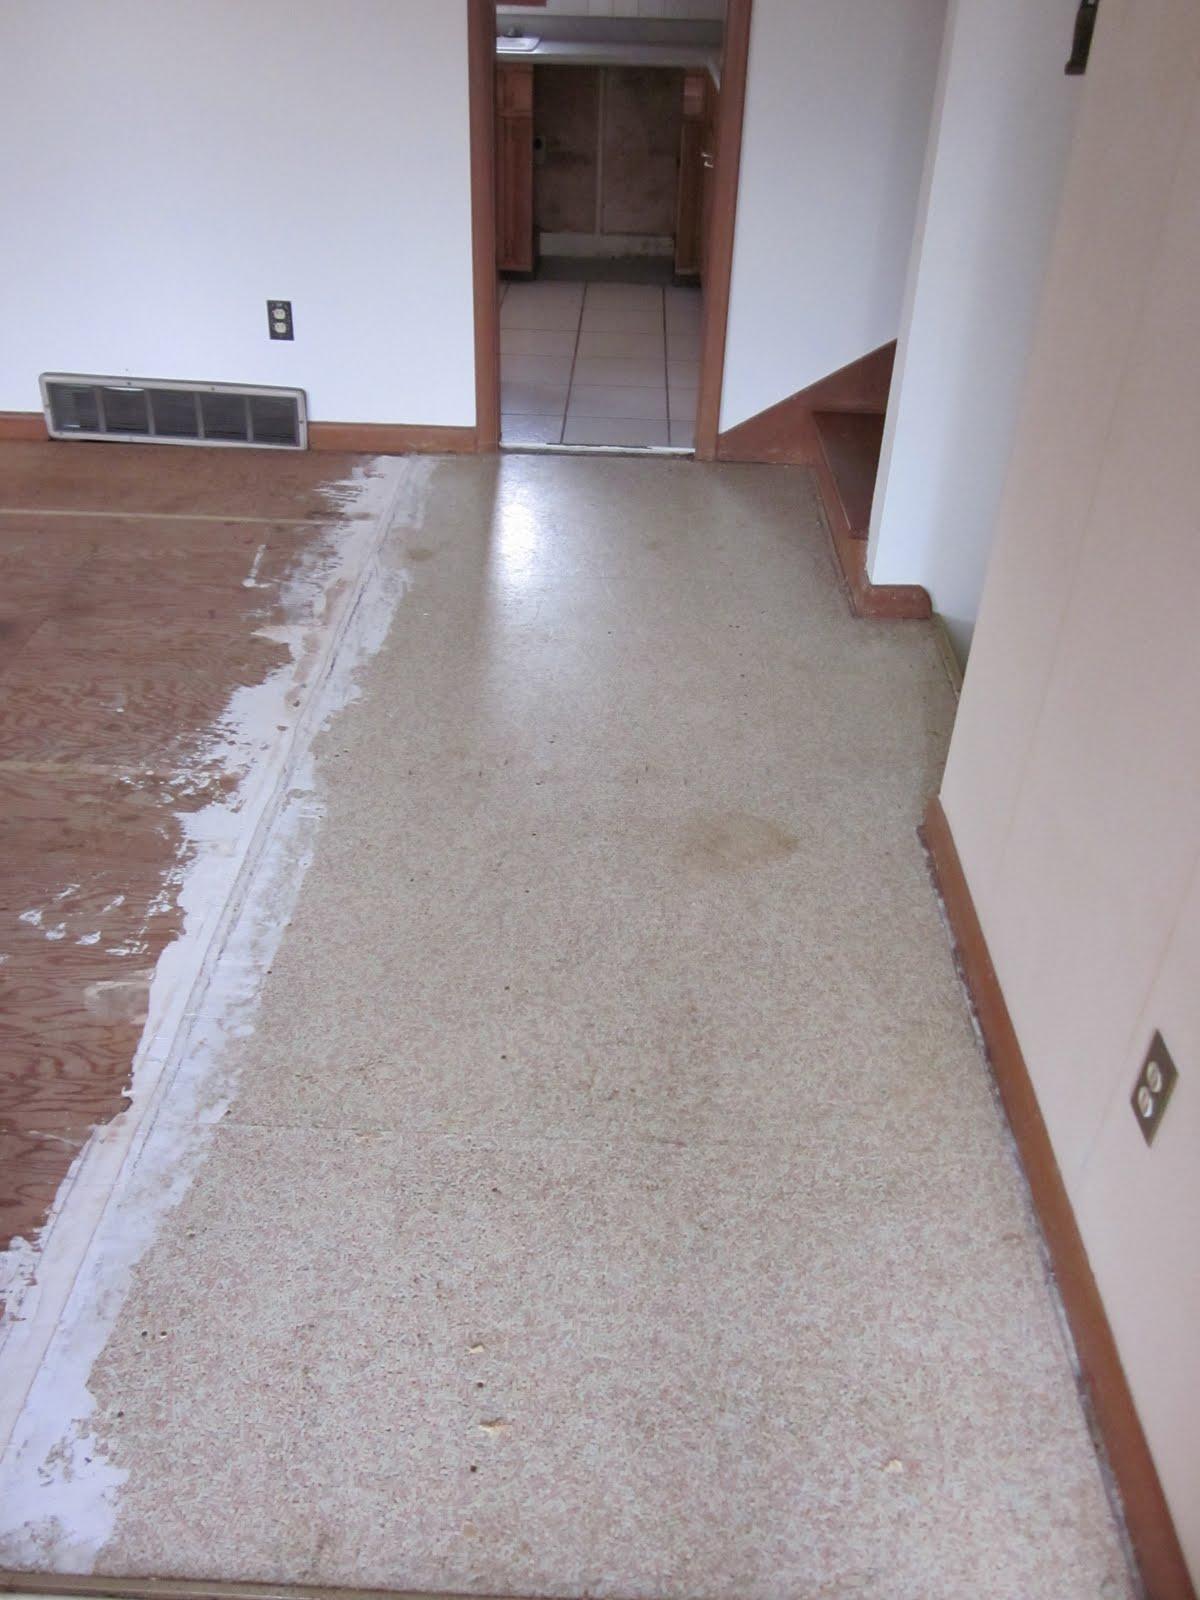 29 Split Entry Living Room Decorating Ideas Keep Home: Split-Level Adventures: Selecting Floor Tile For The